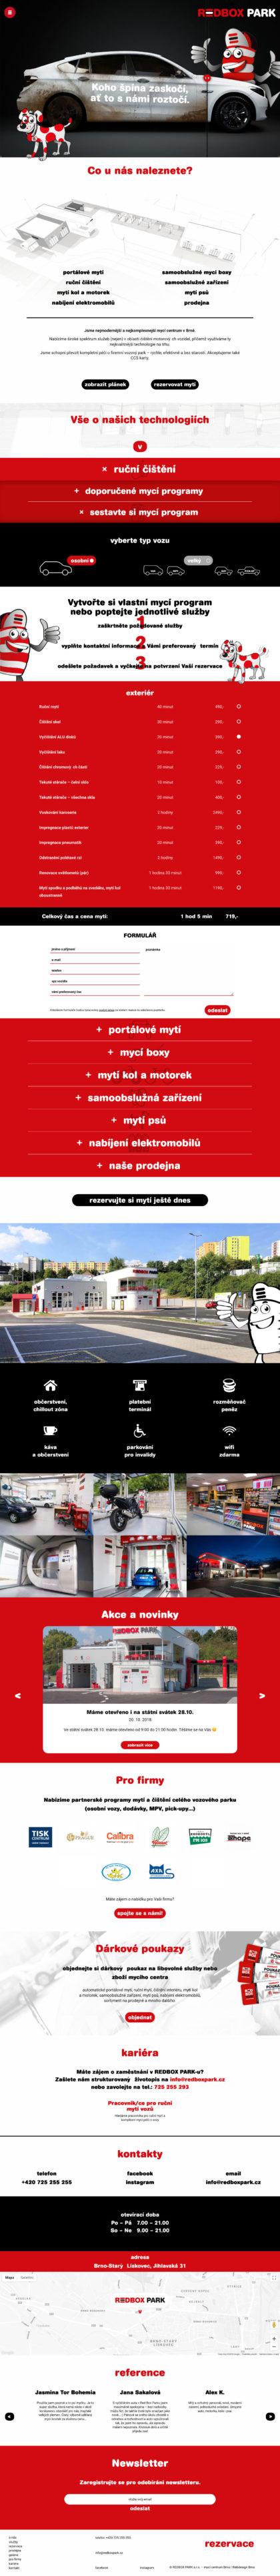 Realizace Webdesign Redbox park